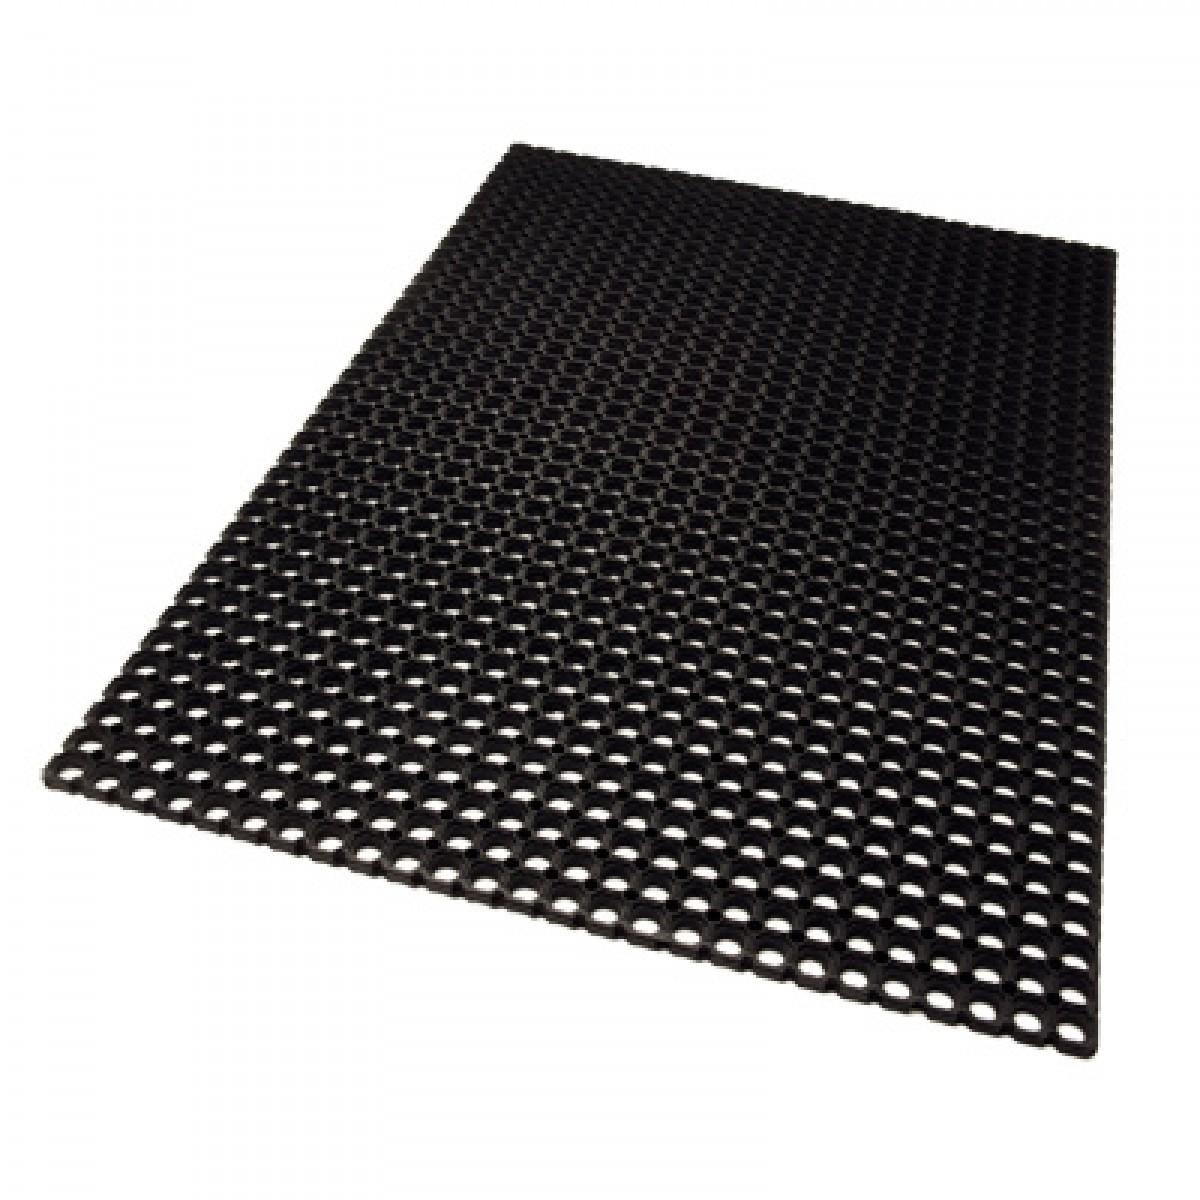 restaurant drainage interlocking mat durable kitchen industrial doormats door matting rm rubber link all inches en anti fatigue commercial purpose mats x area entrance floor